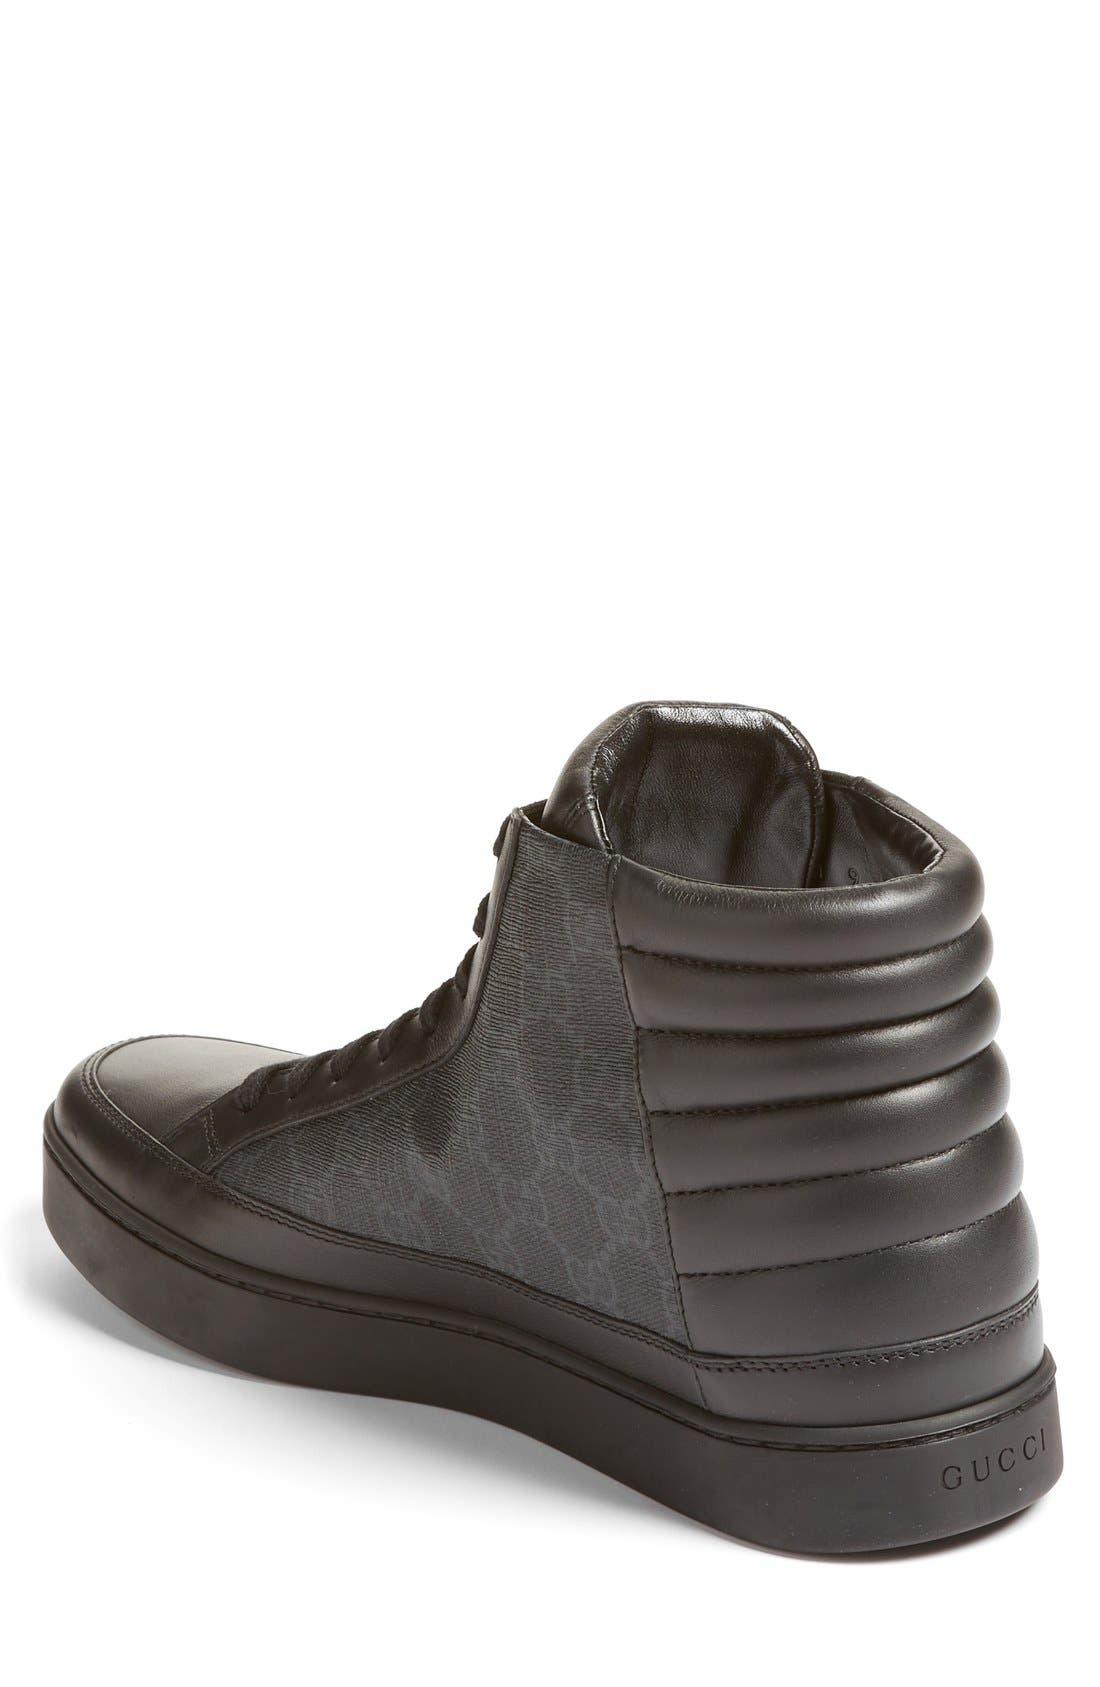 Alternate Image 2  - Gucci 'Common' High Top Sneaker (Men)